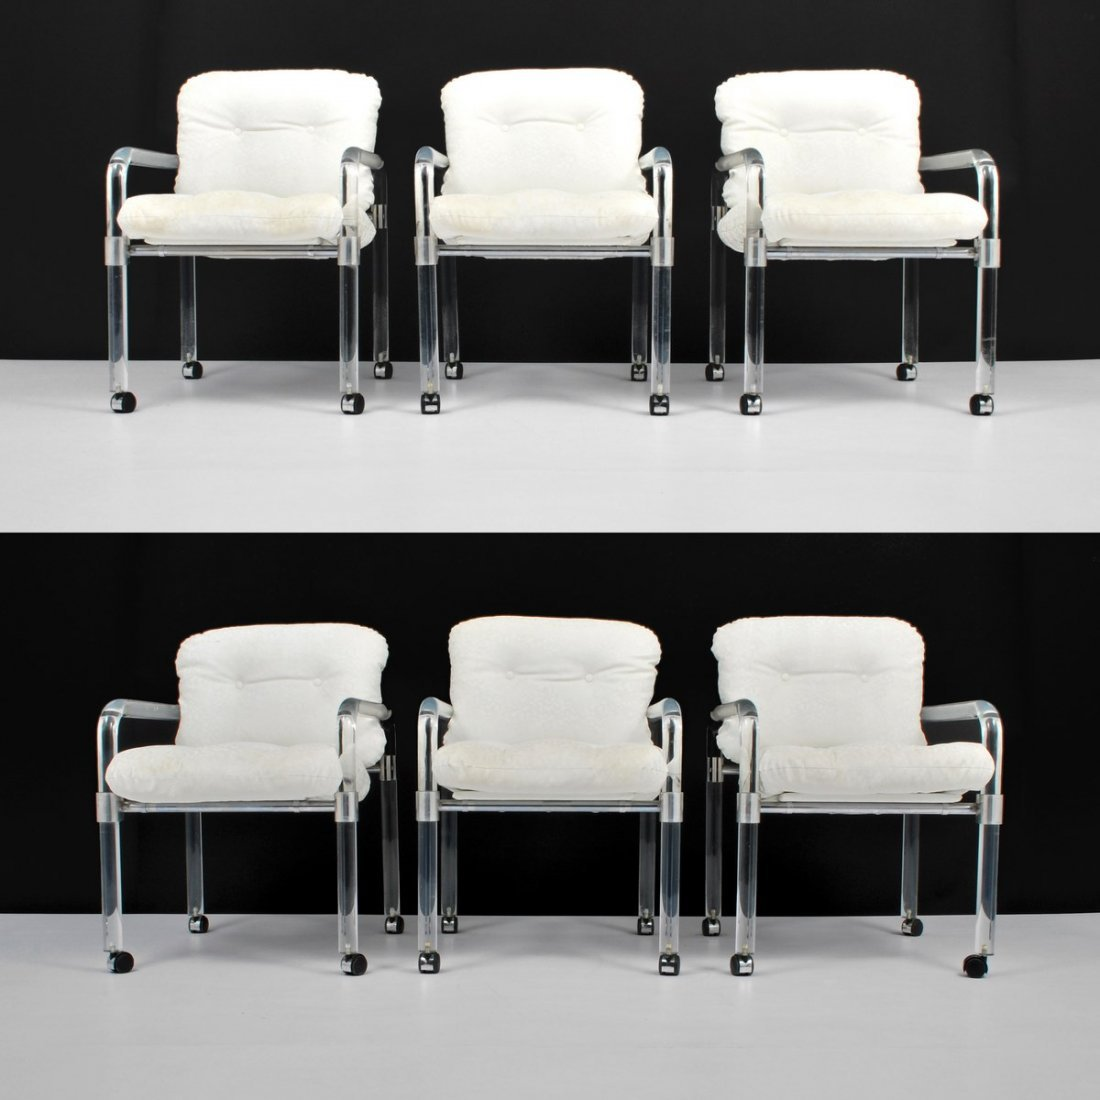 Jeff Messerschmidt Arm Chairs, Set of 6